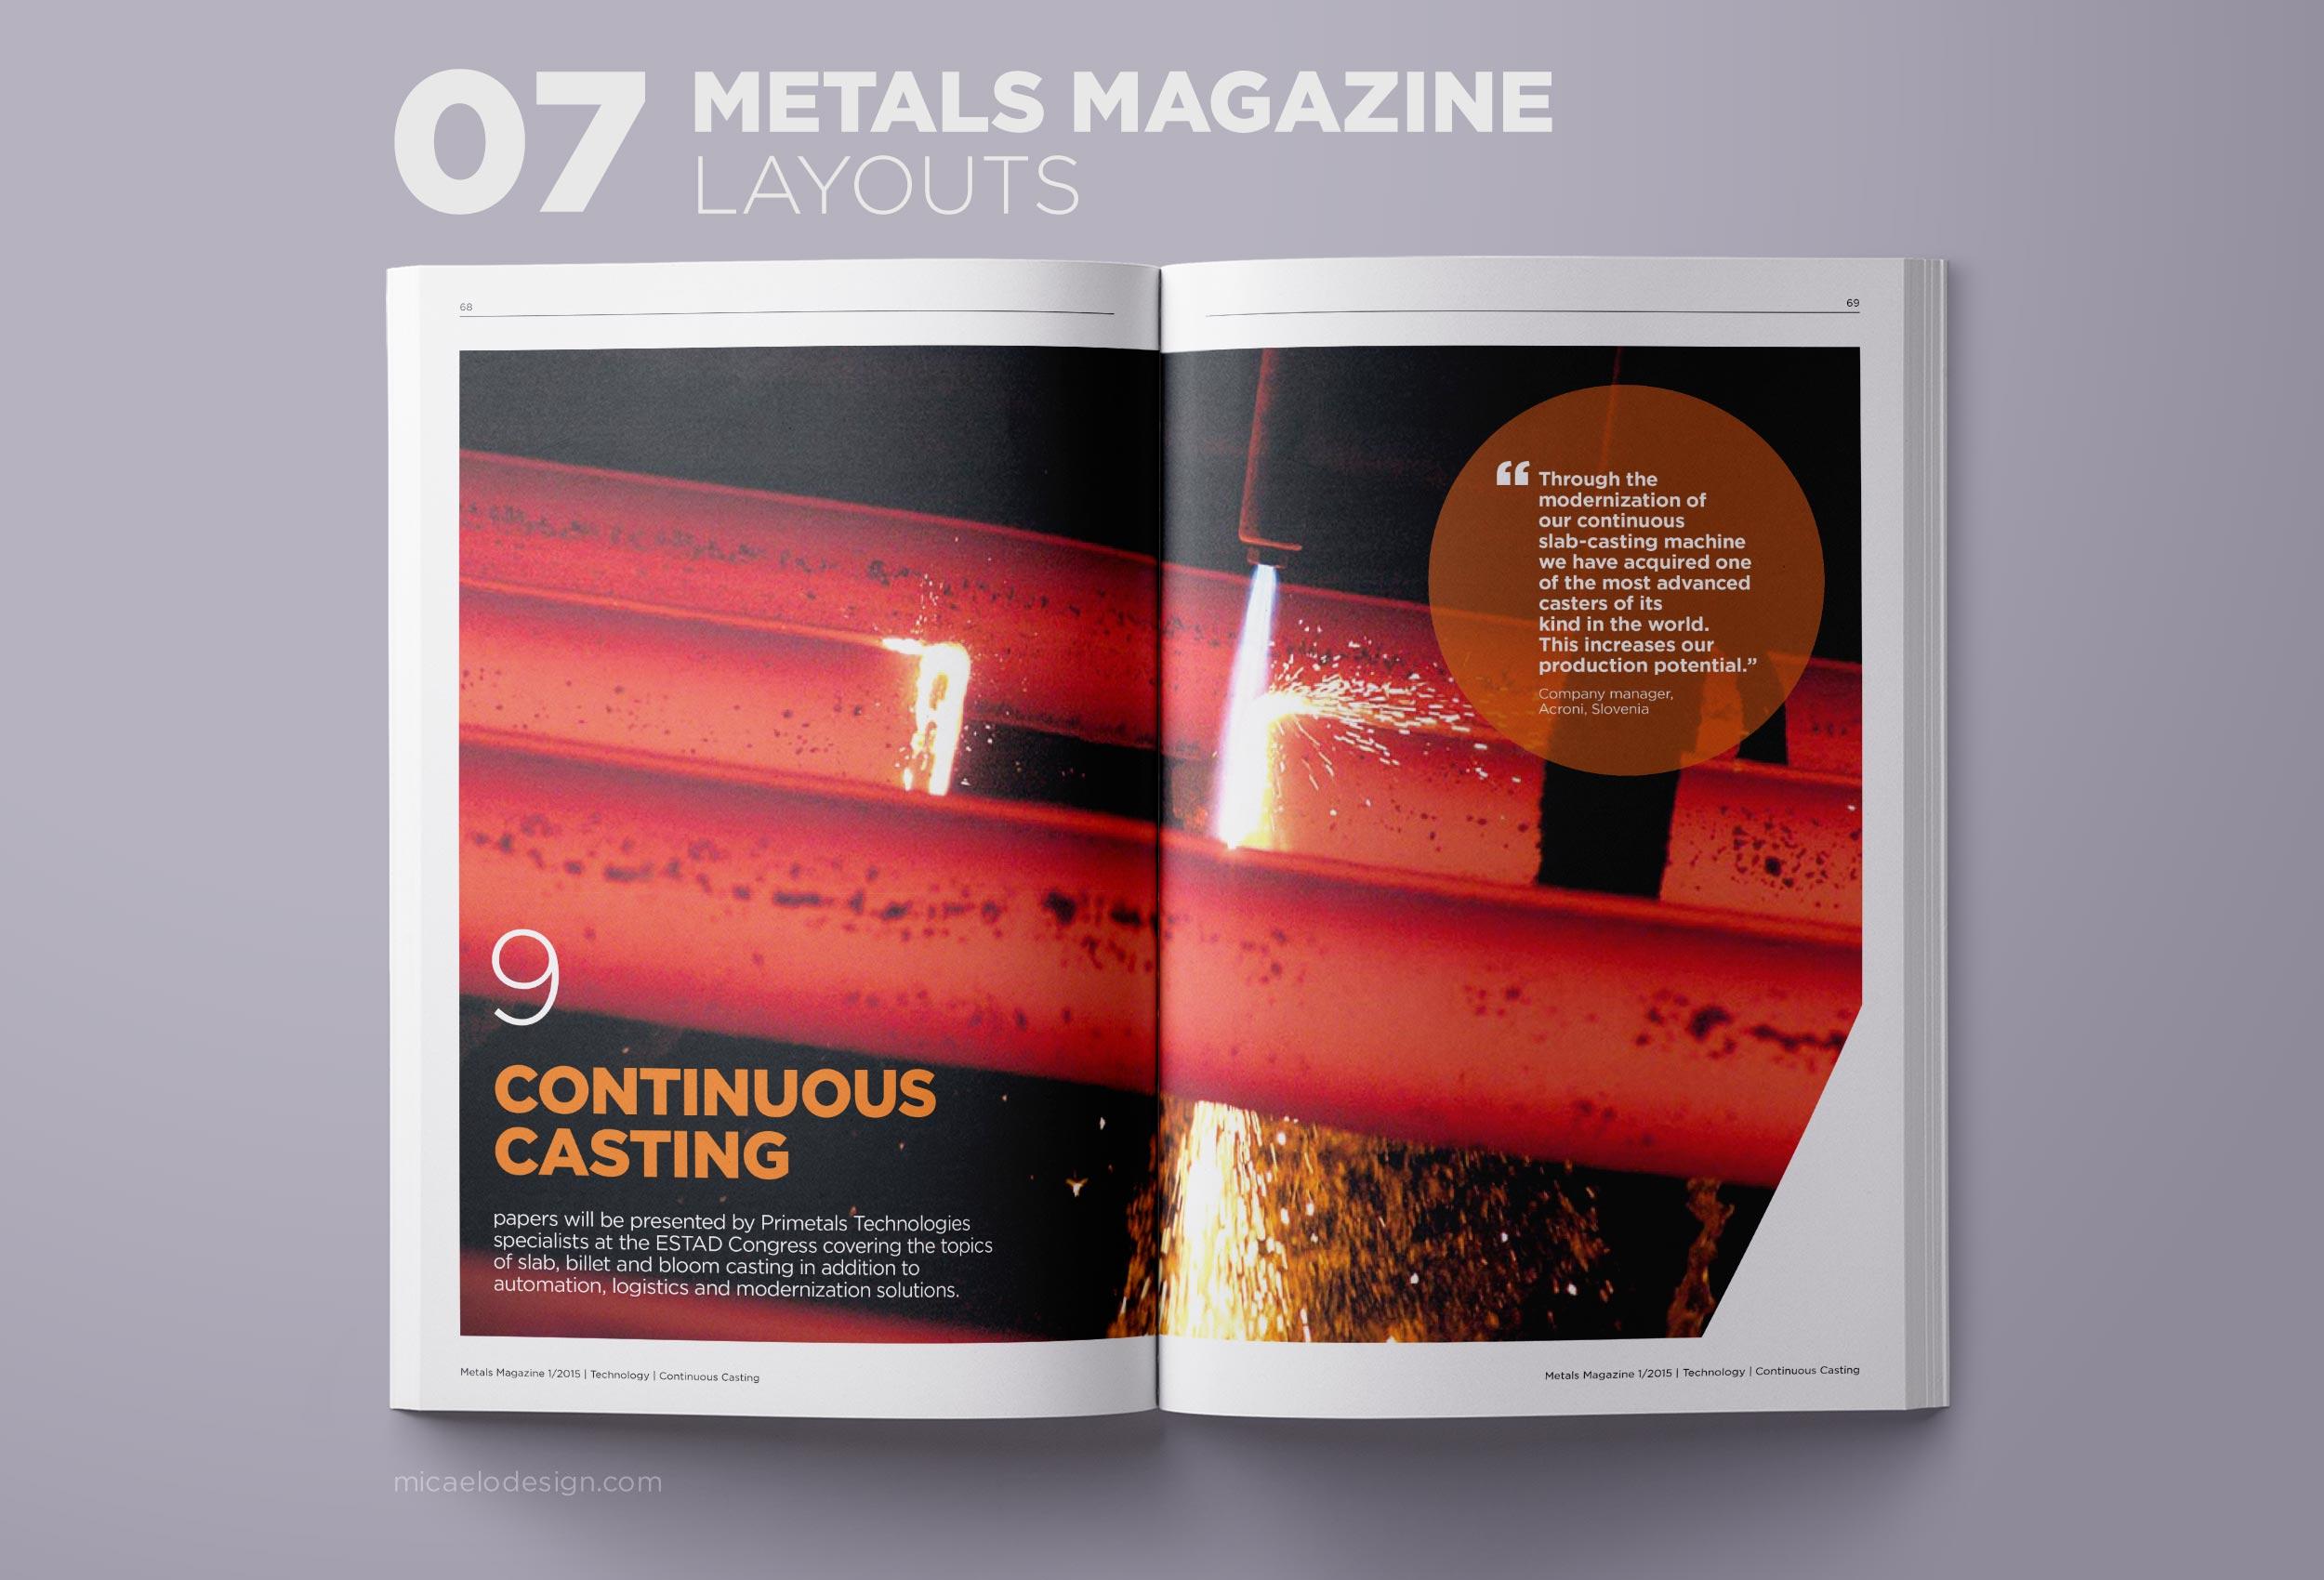 Primetals Metals Magazine layout N07